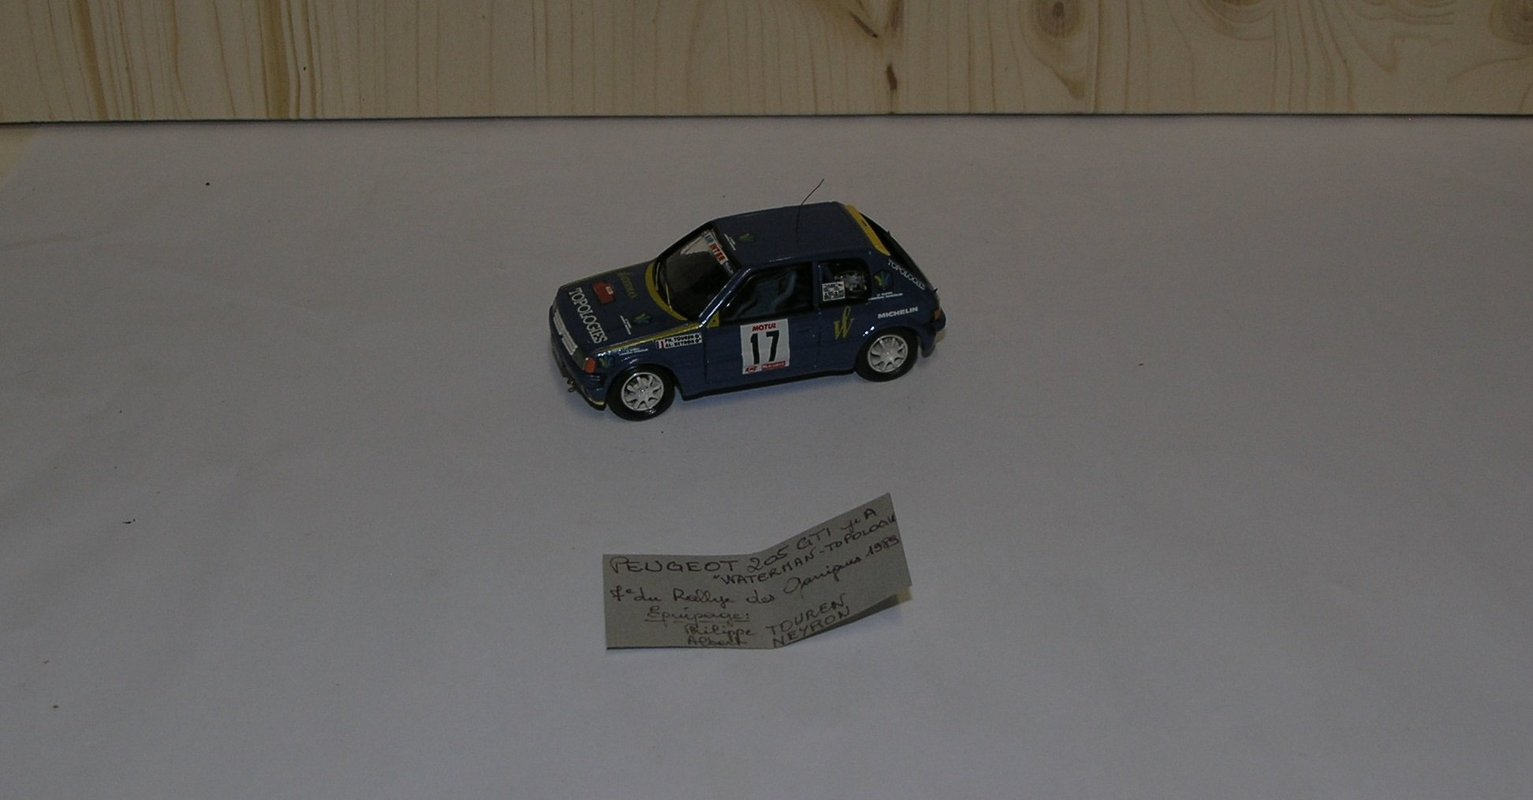 1989-Touren-Neyron-Garrigues.thumb.jpg.ff3a4b2bce2b0474668668e81acd9730.jpg